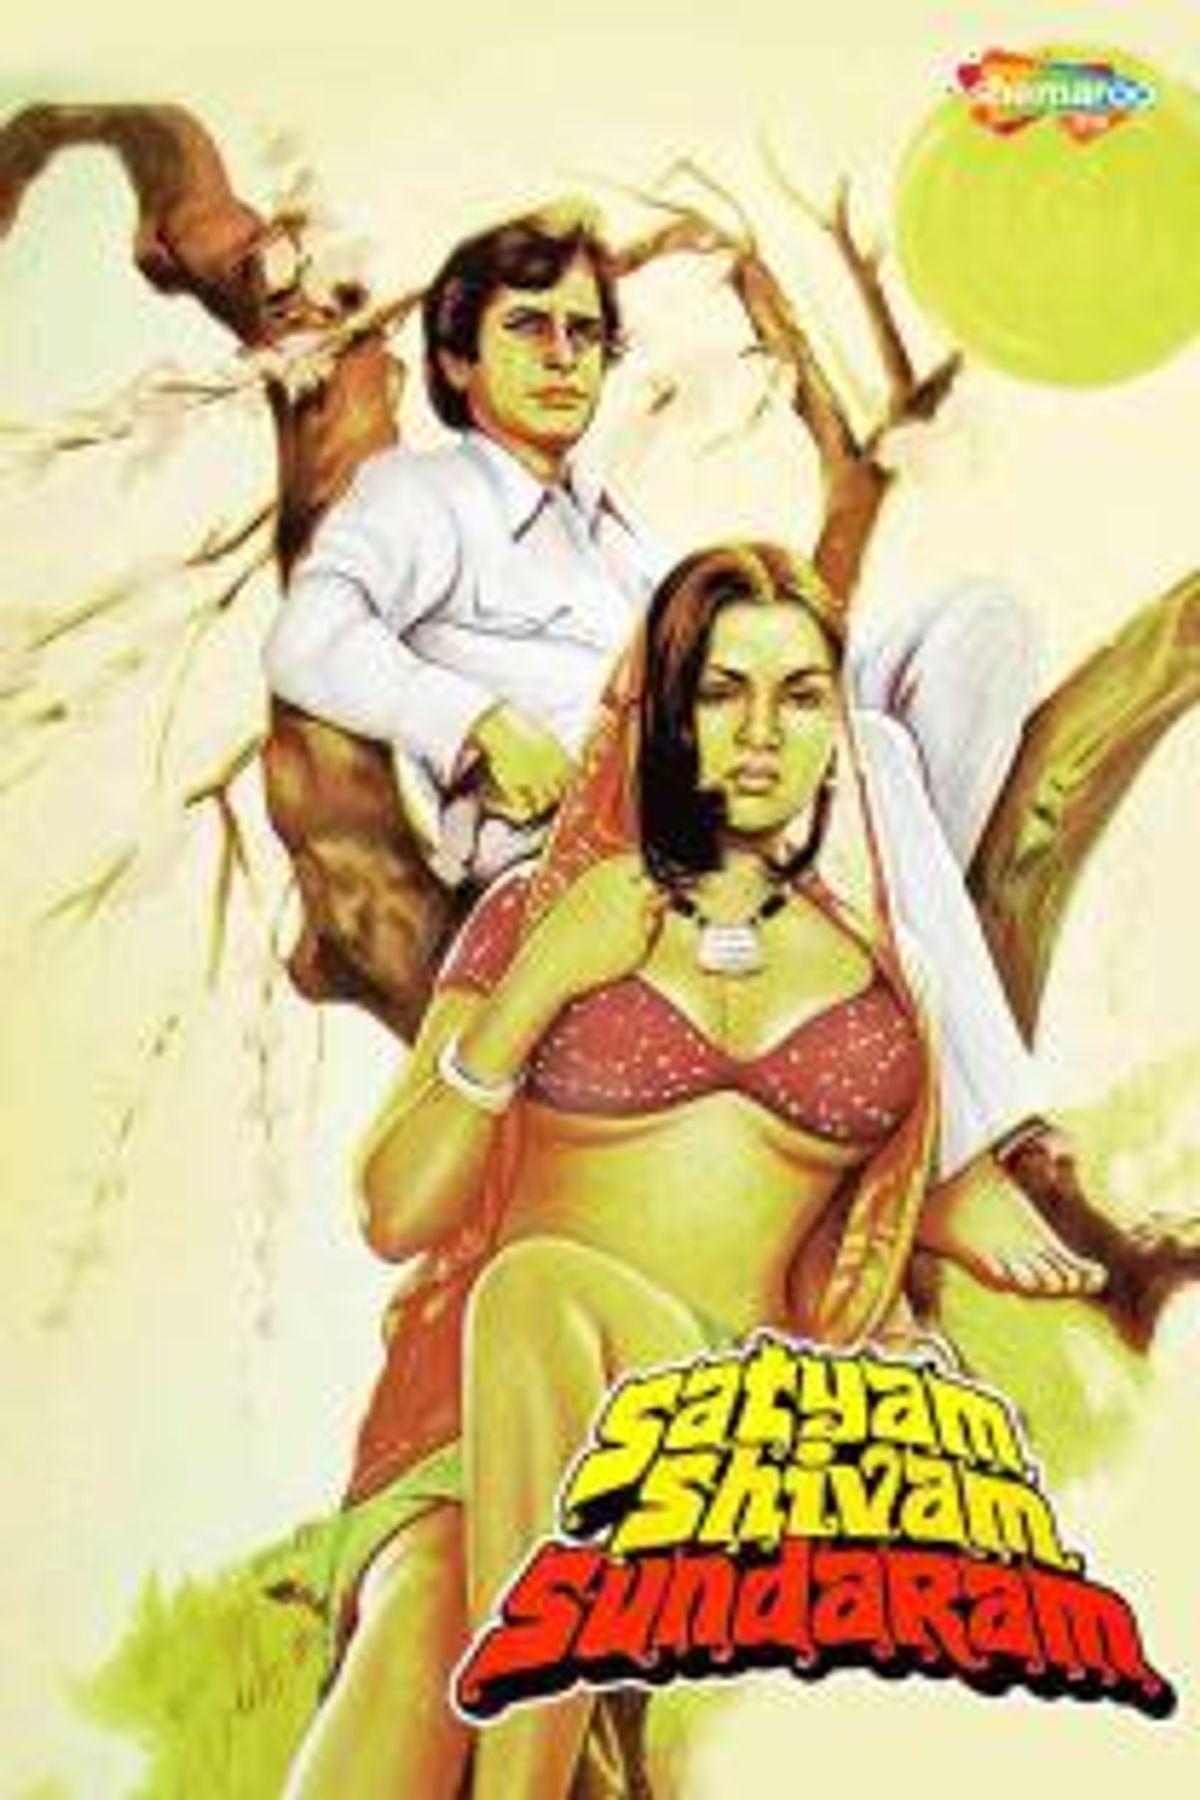 Kanhaiyalal Chaturvedi Best Movies, TV Shows and Web Series List